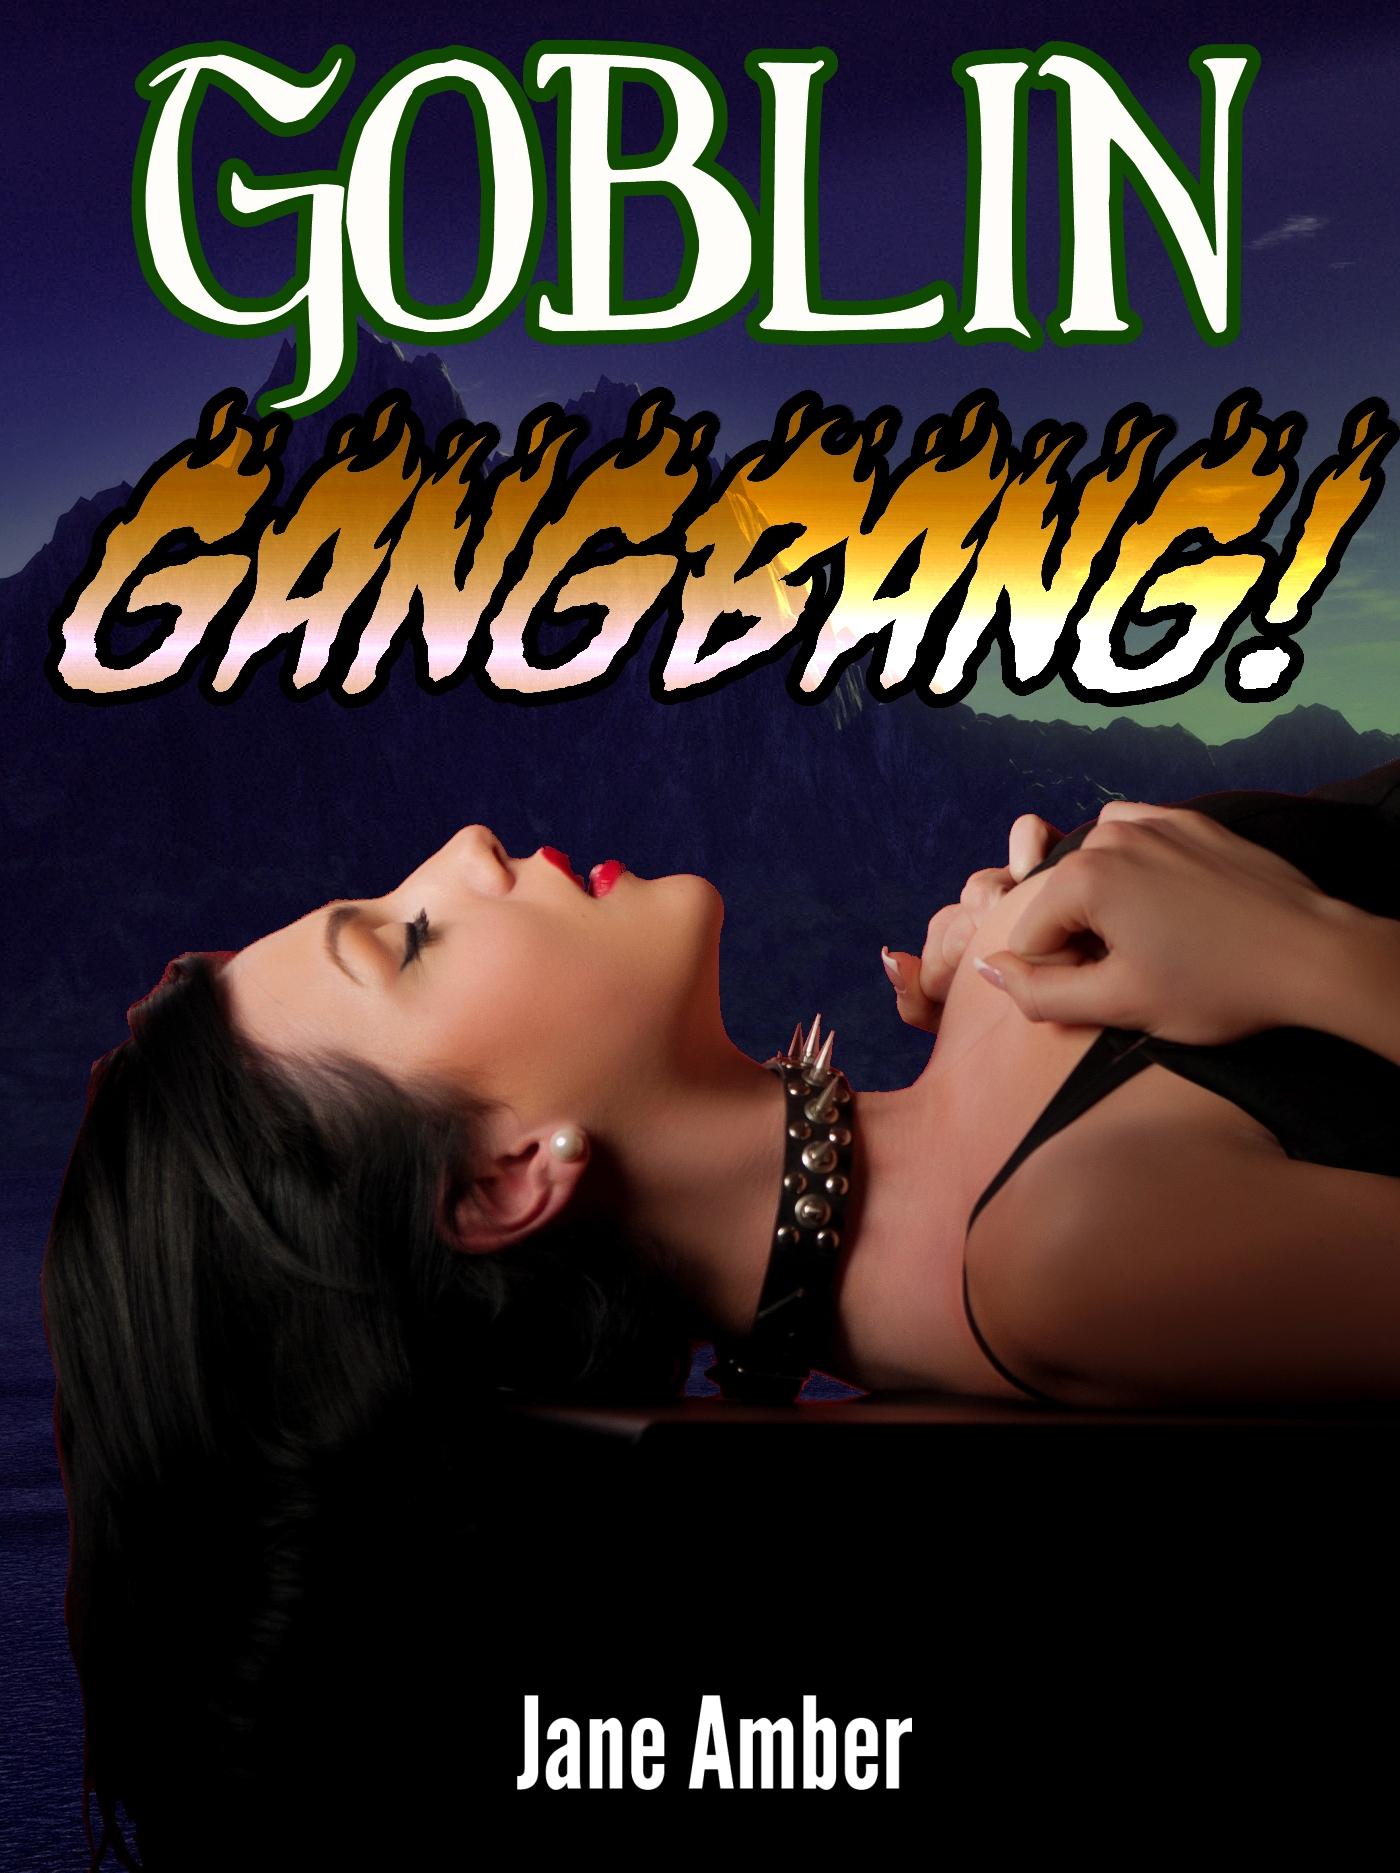 Goblin sex stories sexy movies